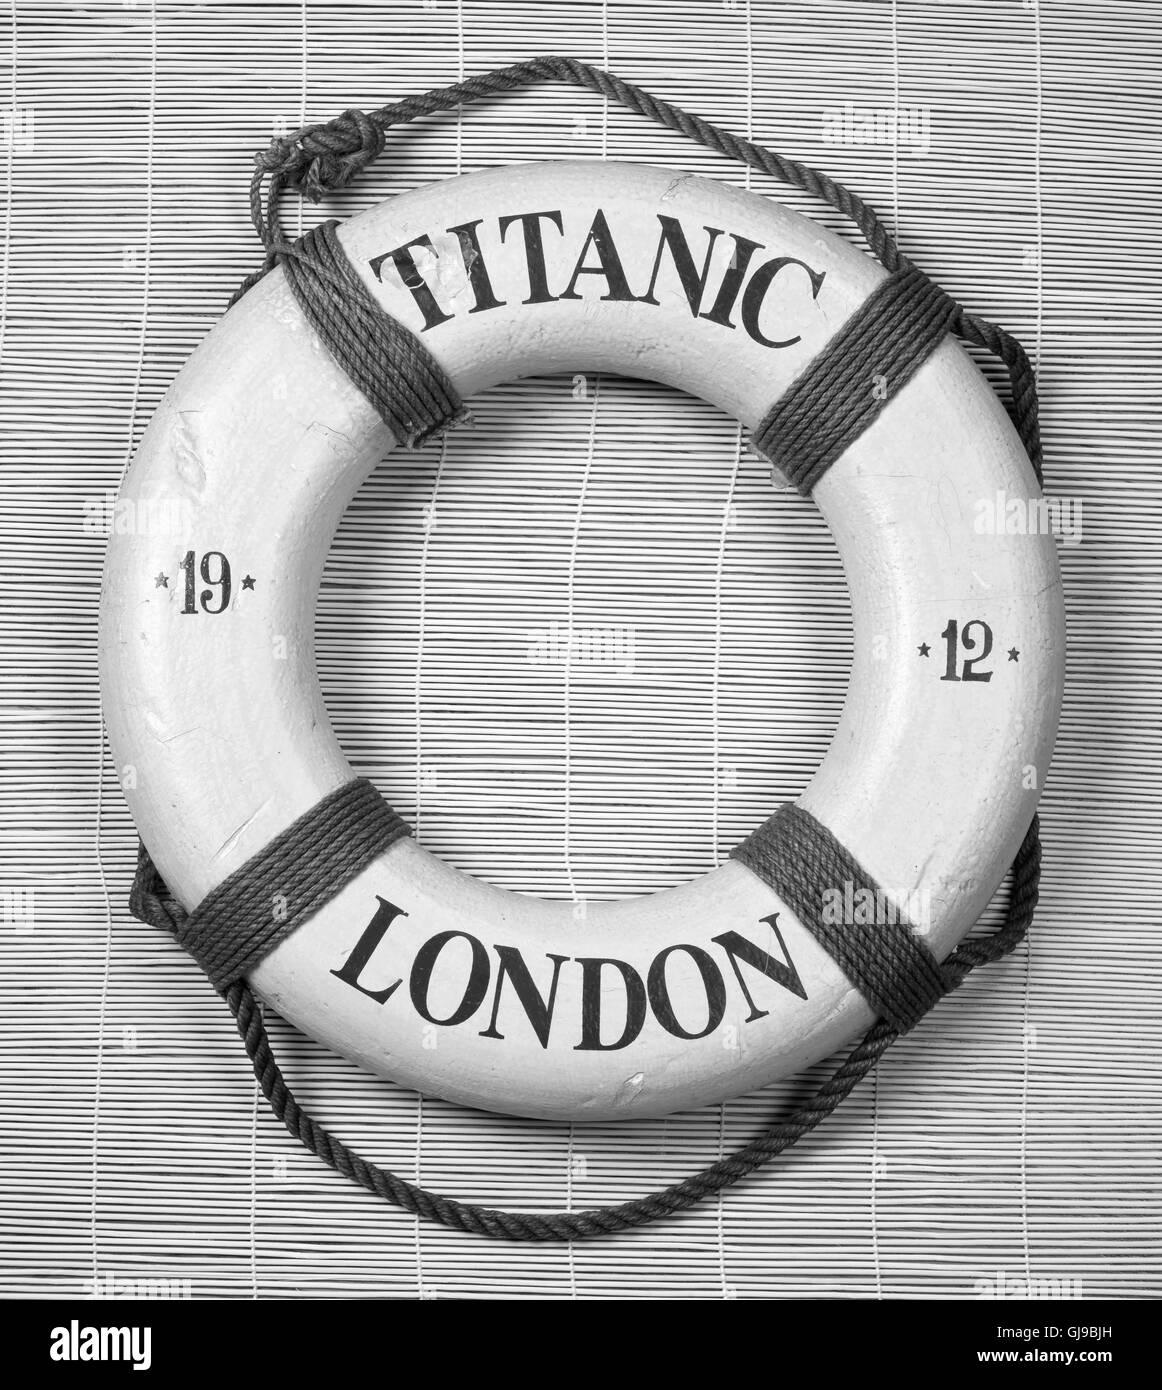 Titanic date